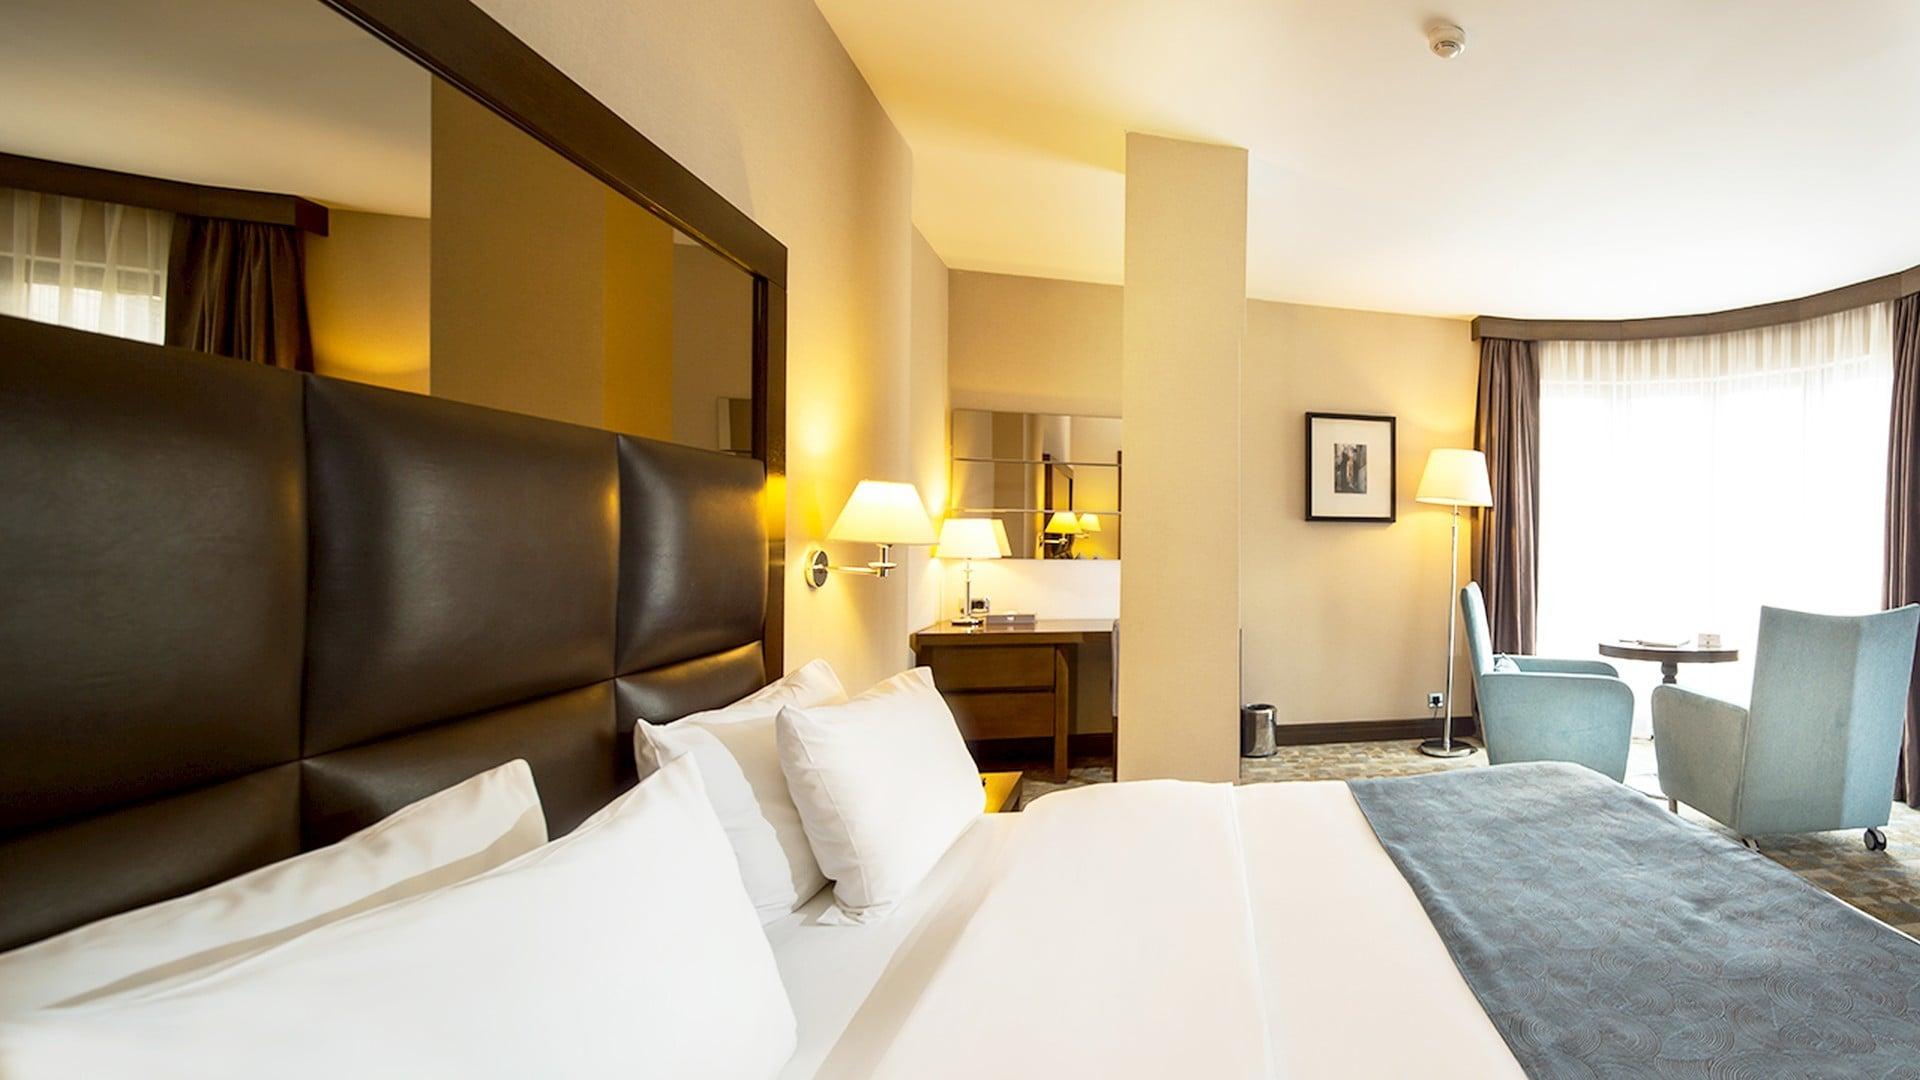 Midtown Hotel Suit Room İnterior